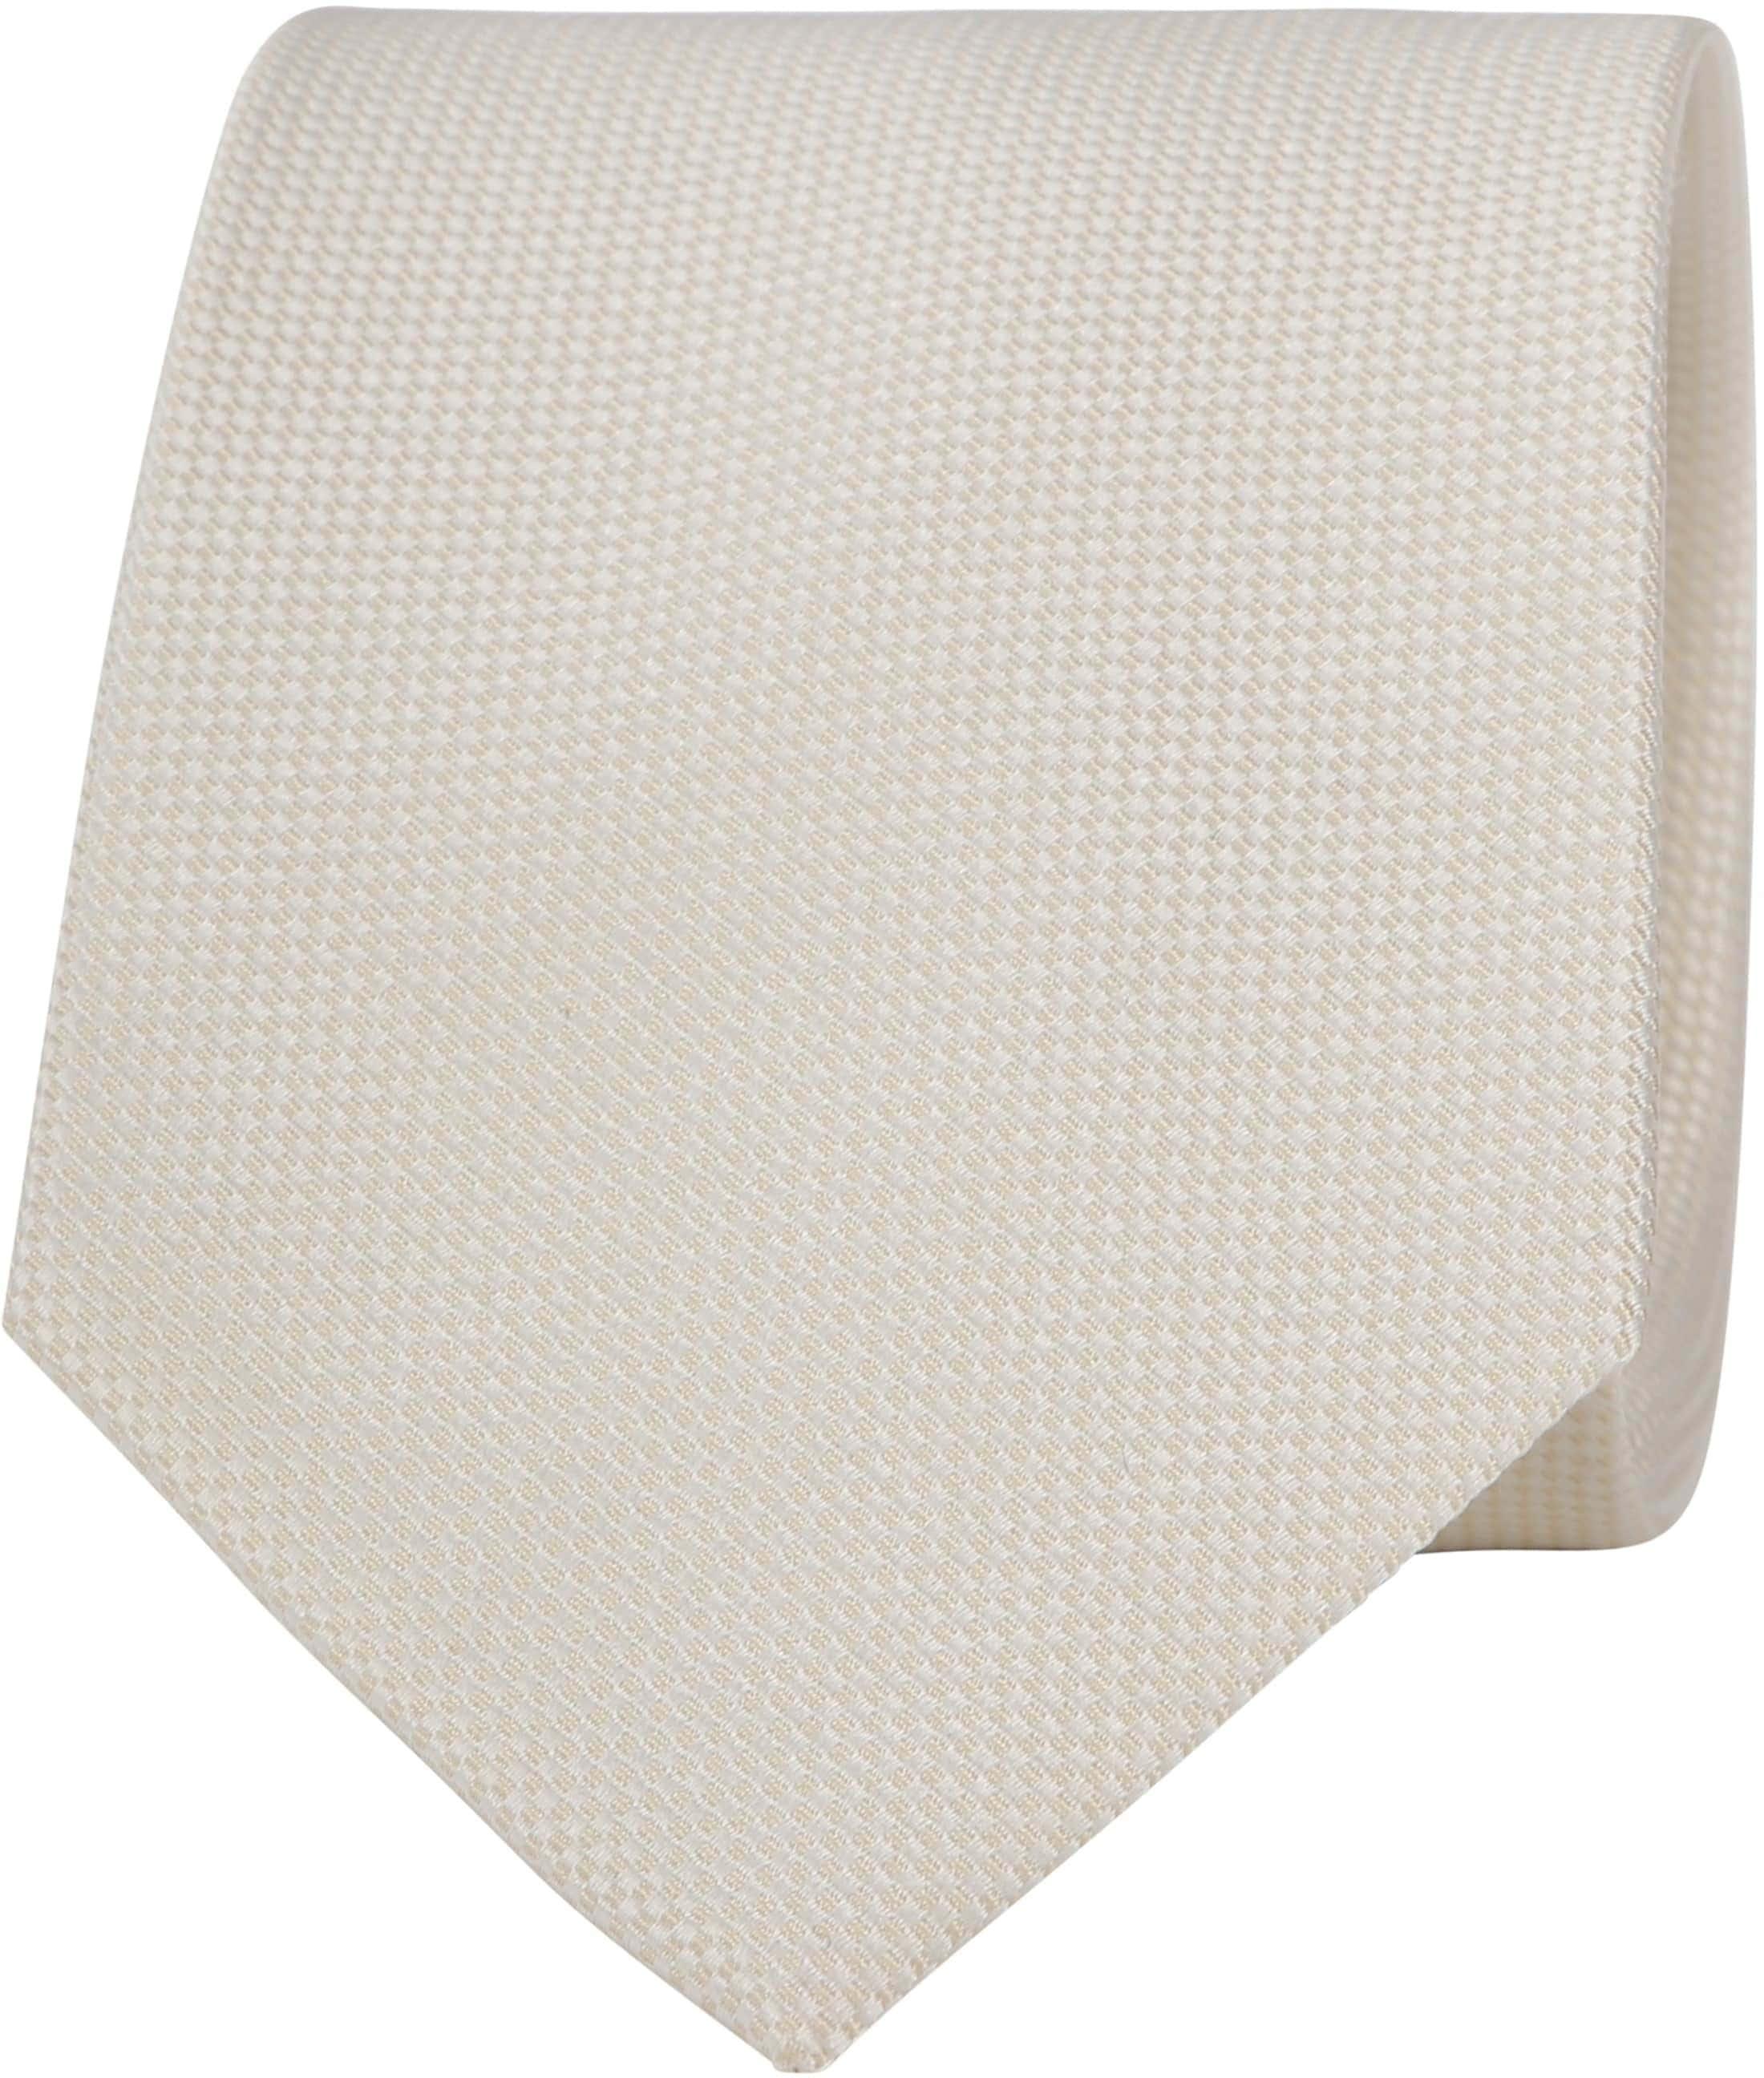 Suitable Krawatte Off-White foto 0